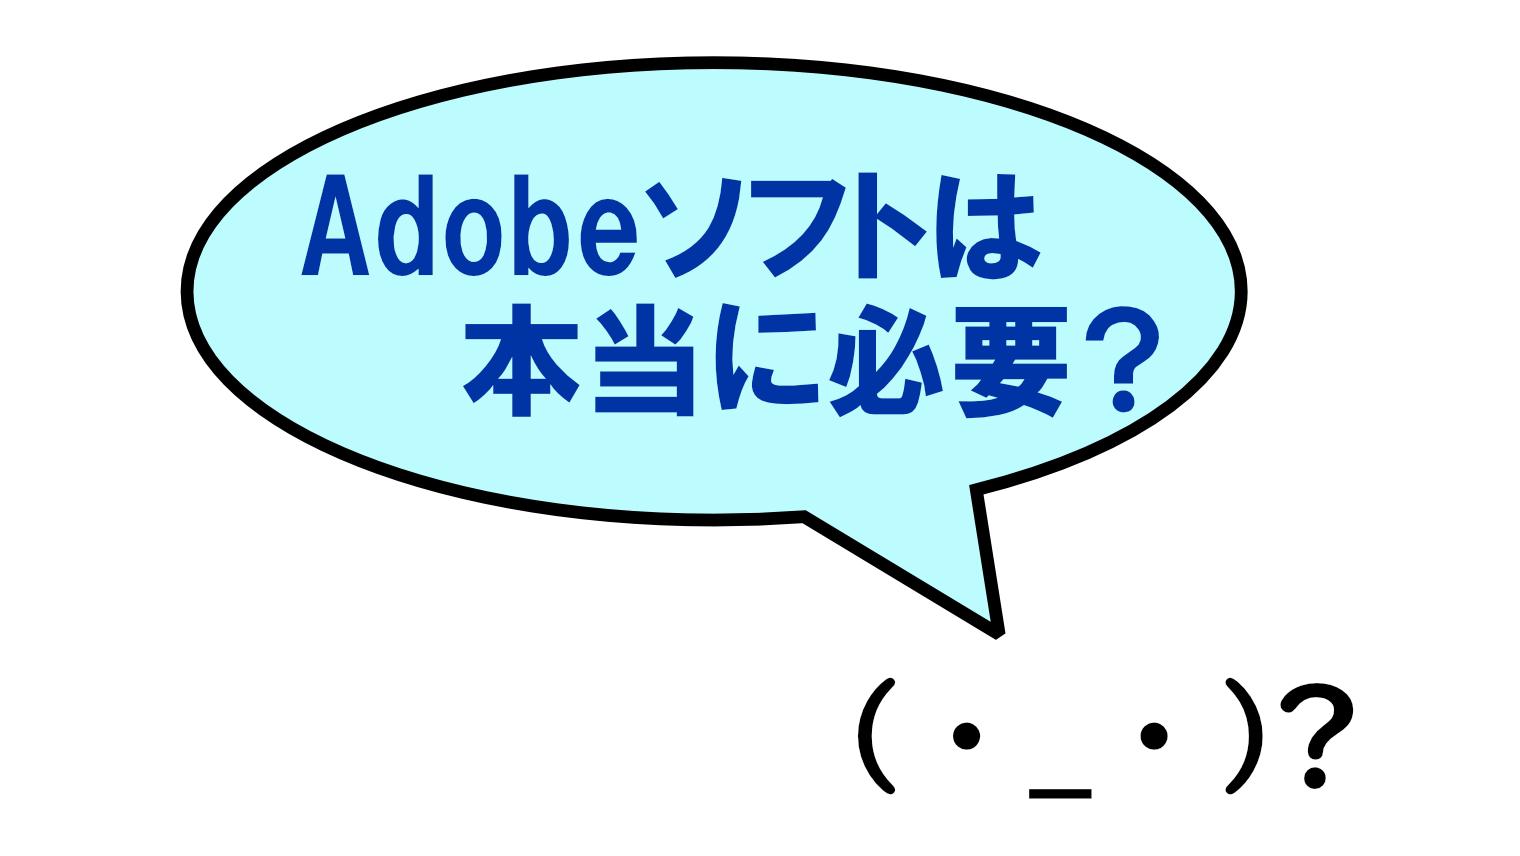 Adobeソフトは本当に必要?【学生・DTPは絶対に必要!】